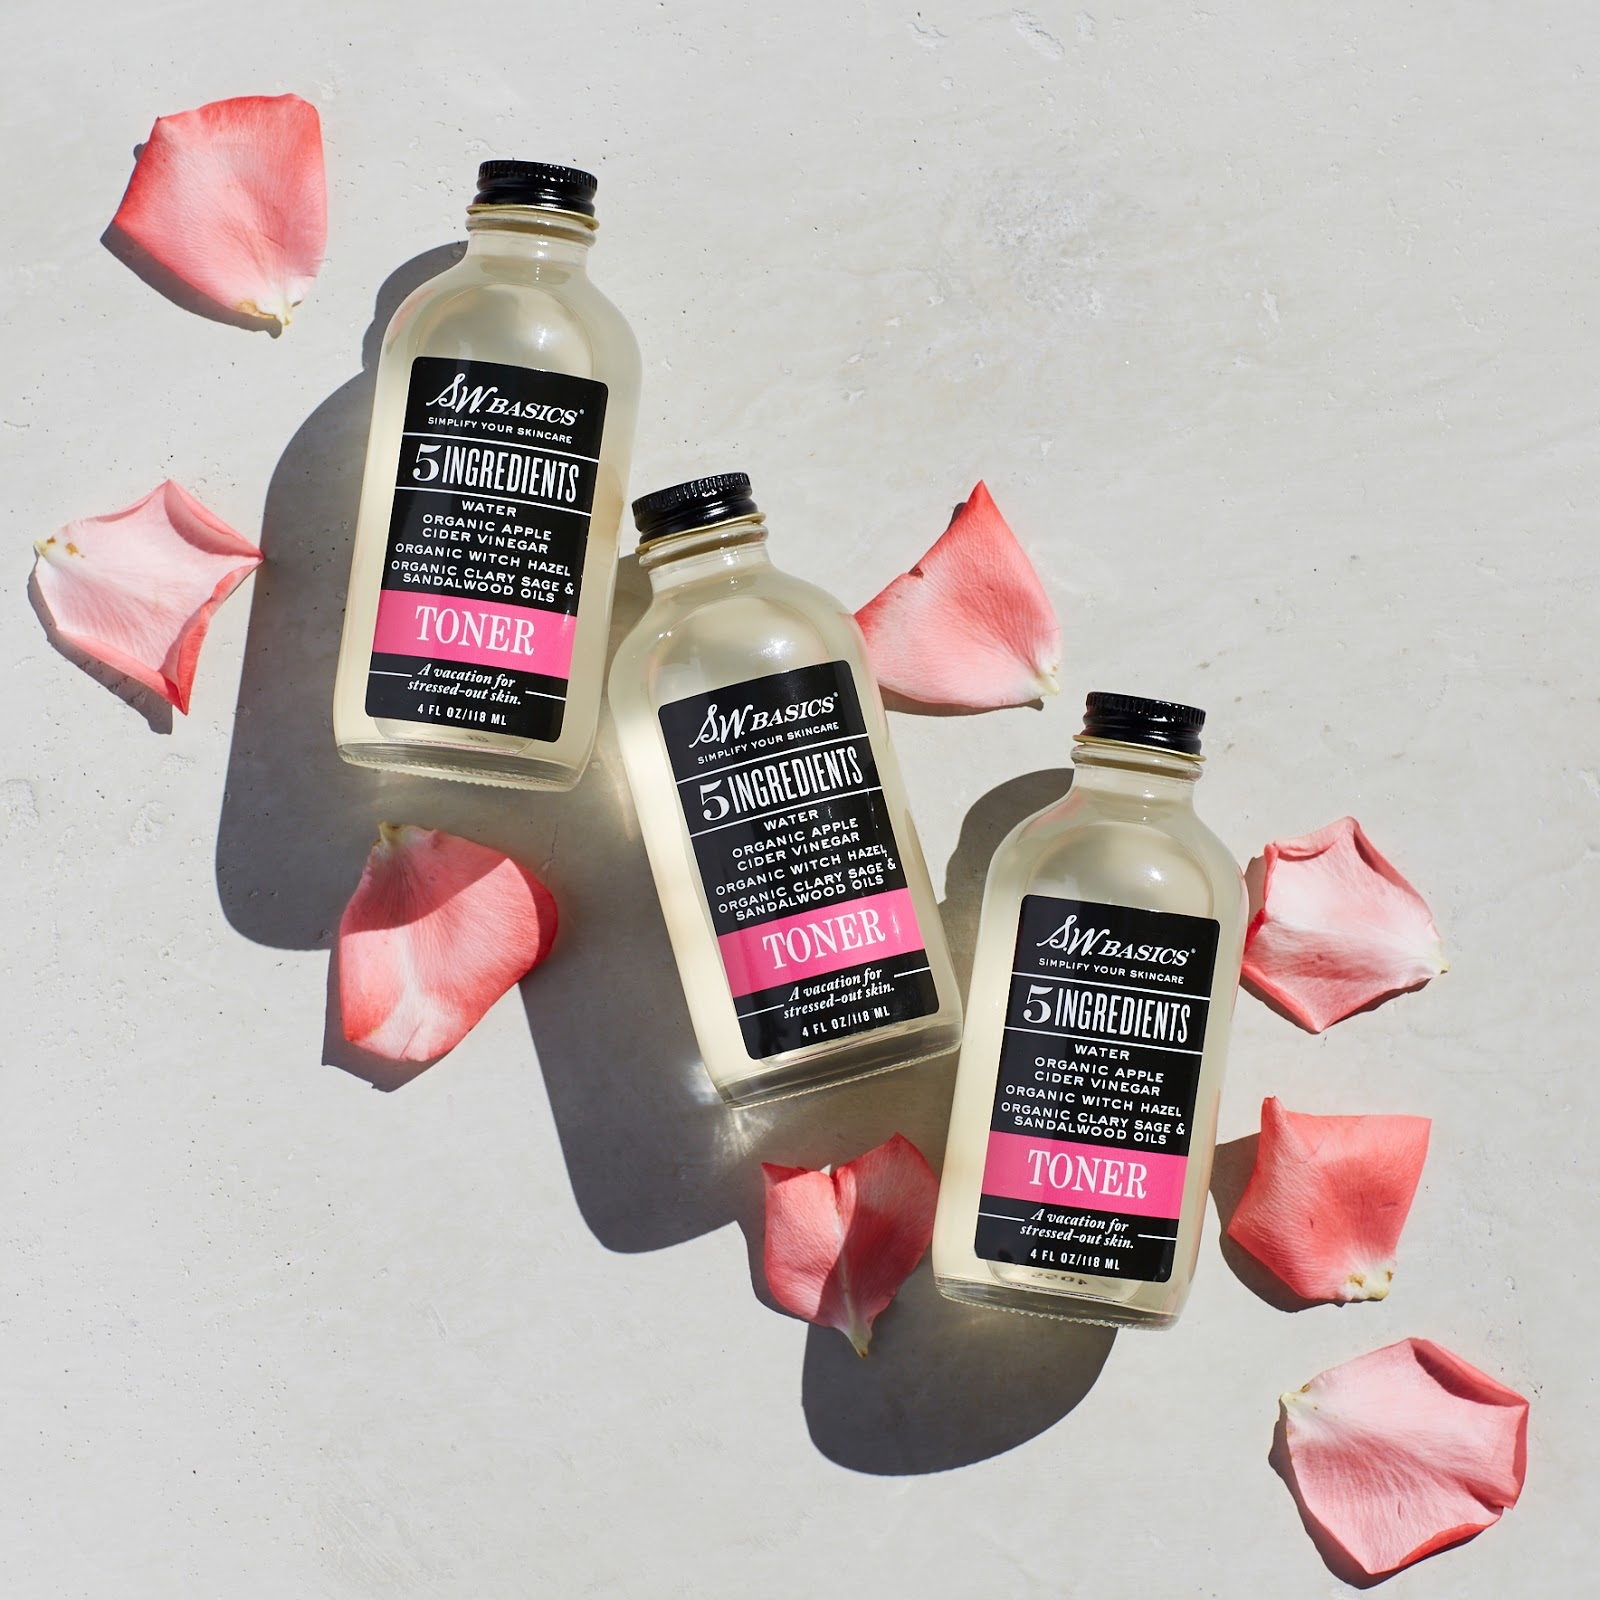 S.W. Basics Toner Review SW Basics organic natural skincare target affordable hellolindasau acne remedy apple cider vinegar